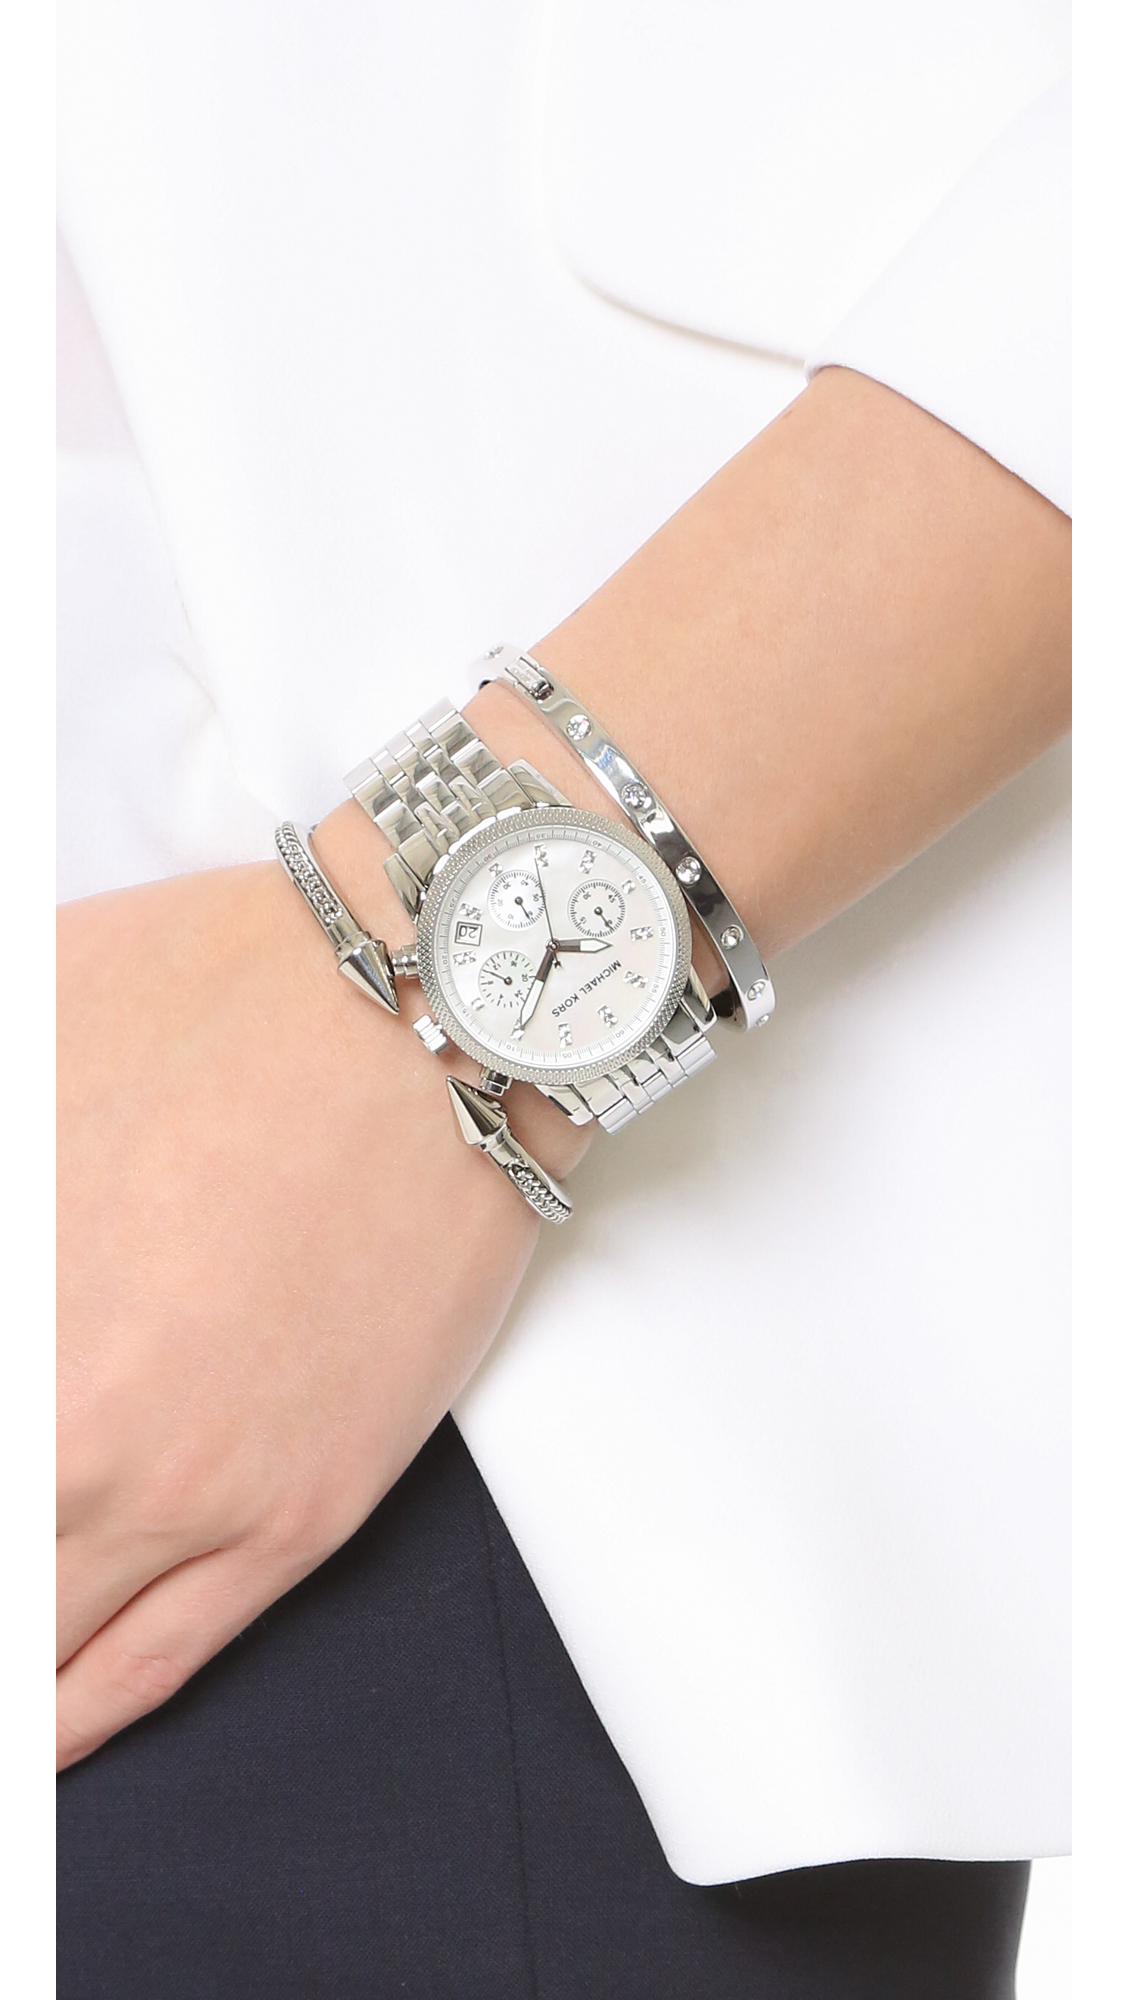 7ccde777aeca Michael Kors Ritz Rose Gold Tone Watch Style Mk6357 - Image Of Bear ...